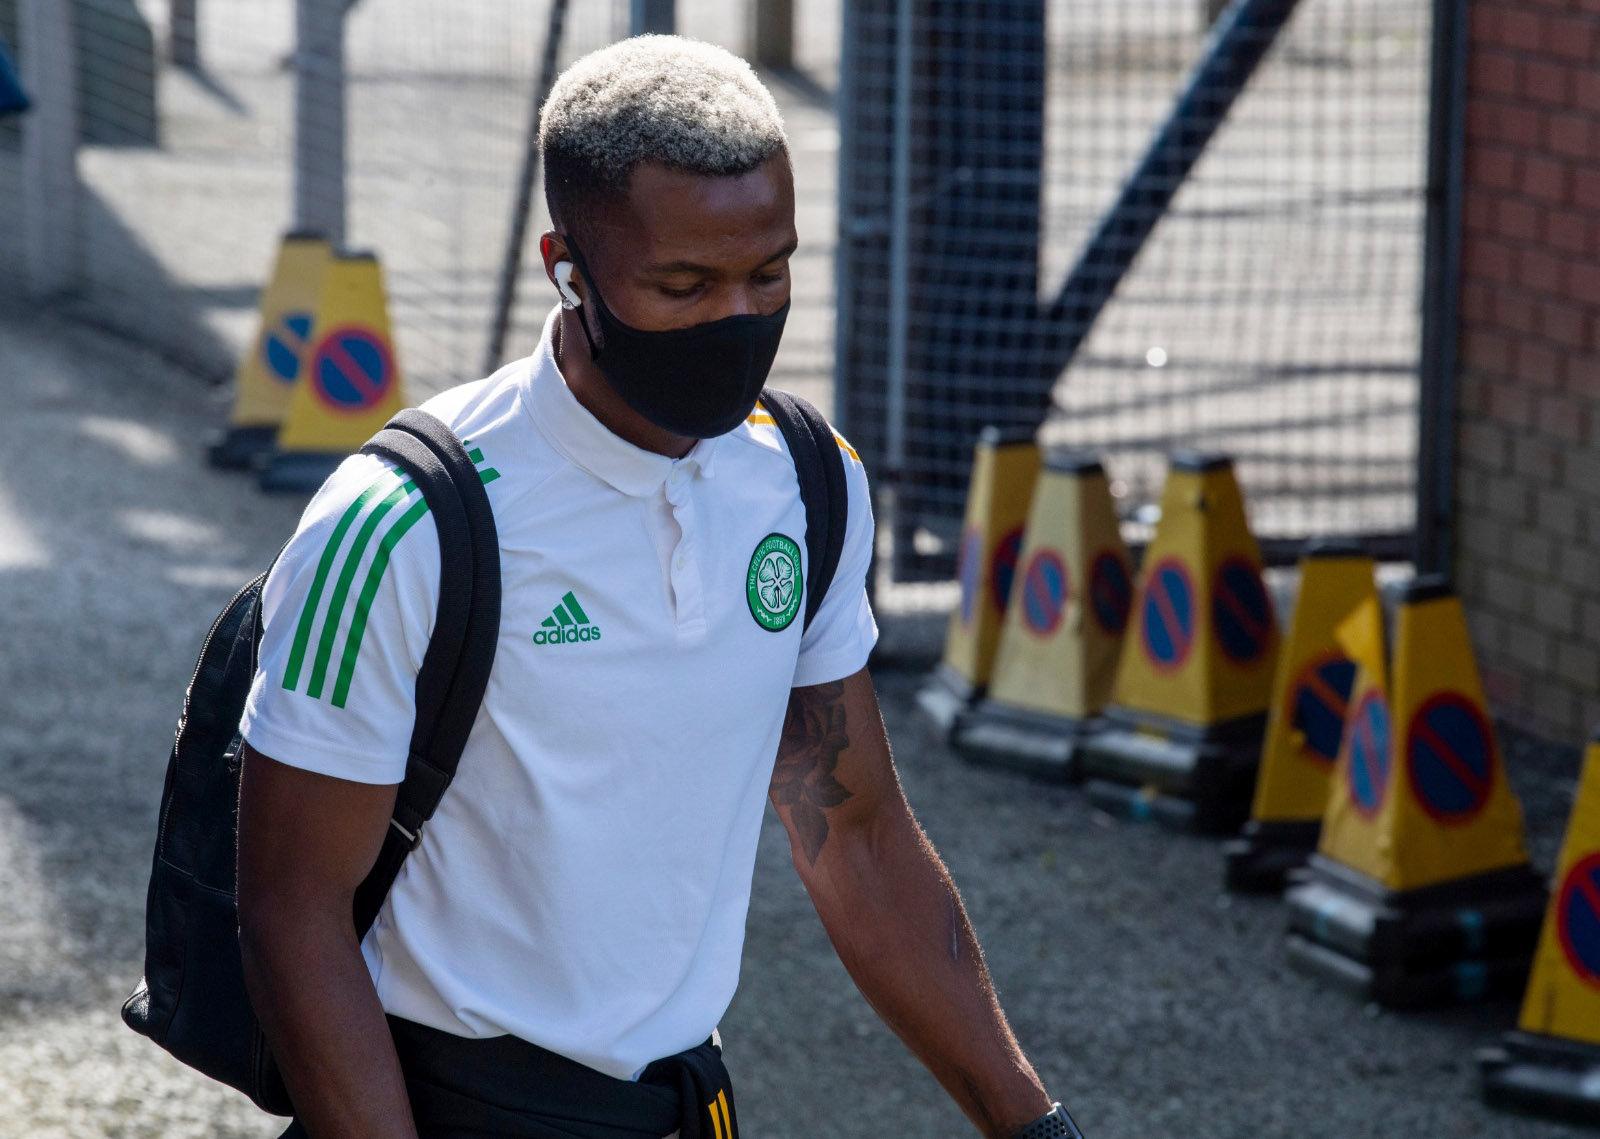 Boli Bolingoli in 'Let's go' message as Celtic teammates Edouard and Dembele respond